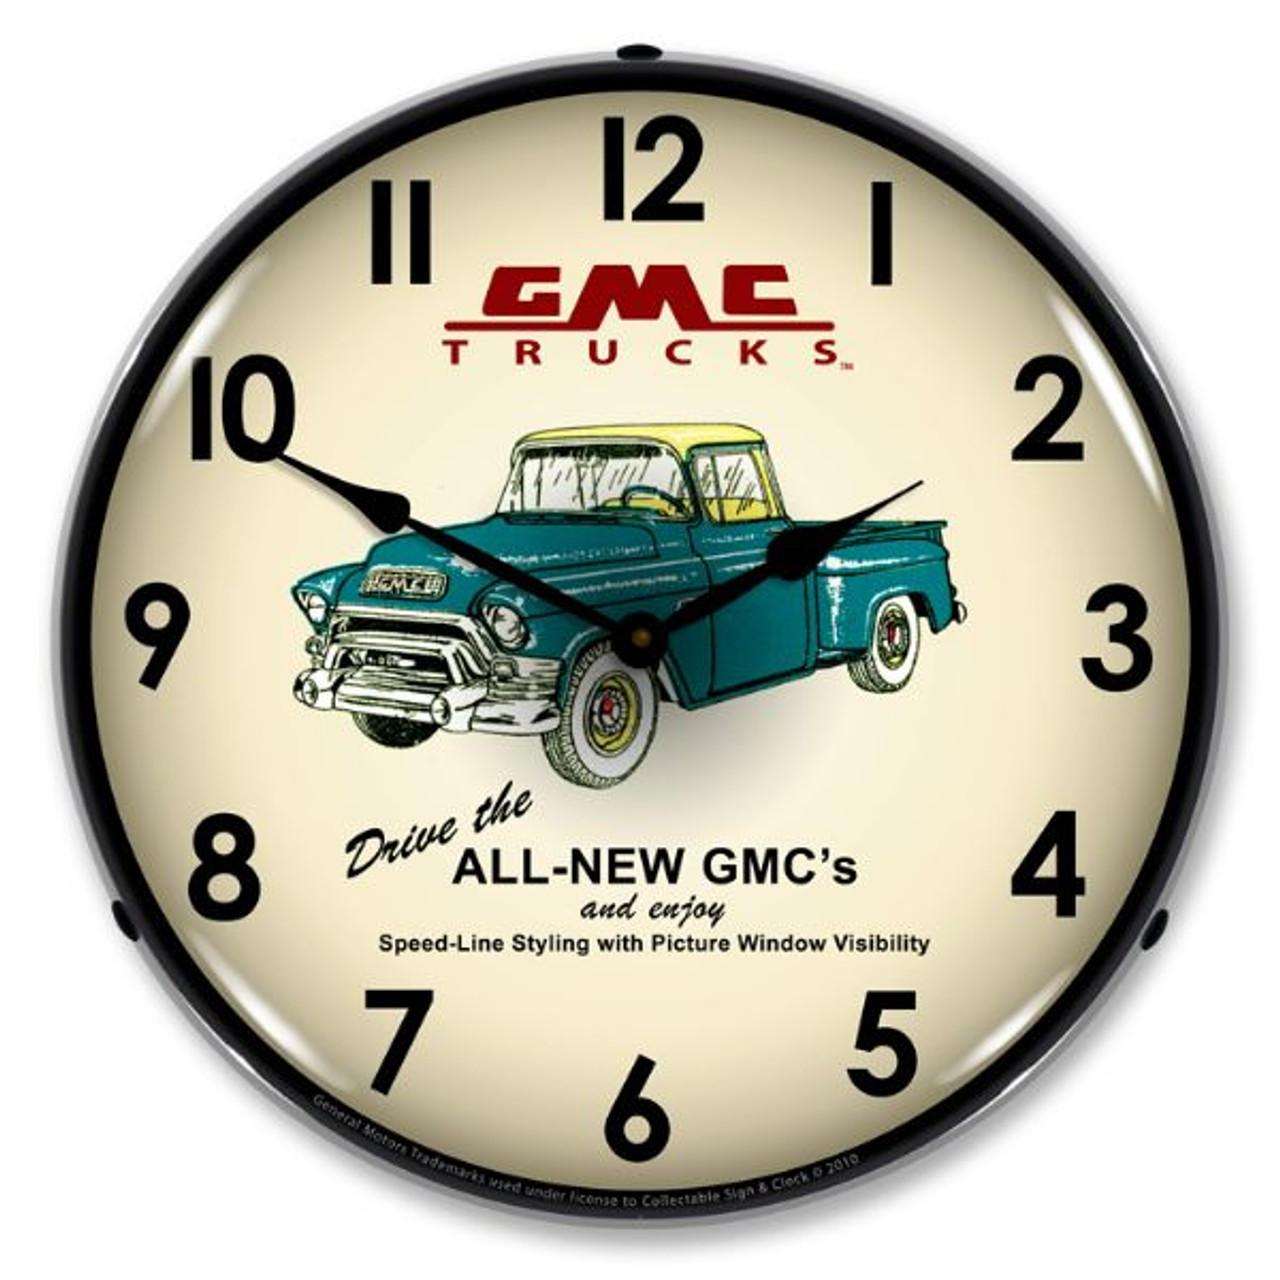 GMC Trucks 1956 Lighted Wall Clock